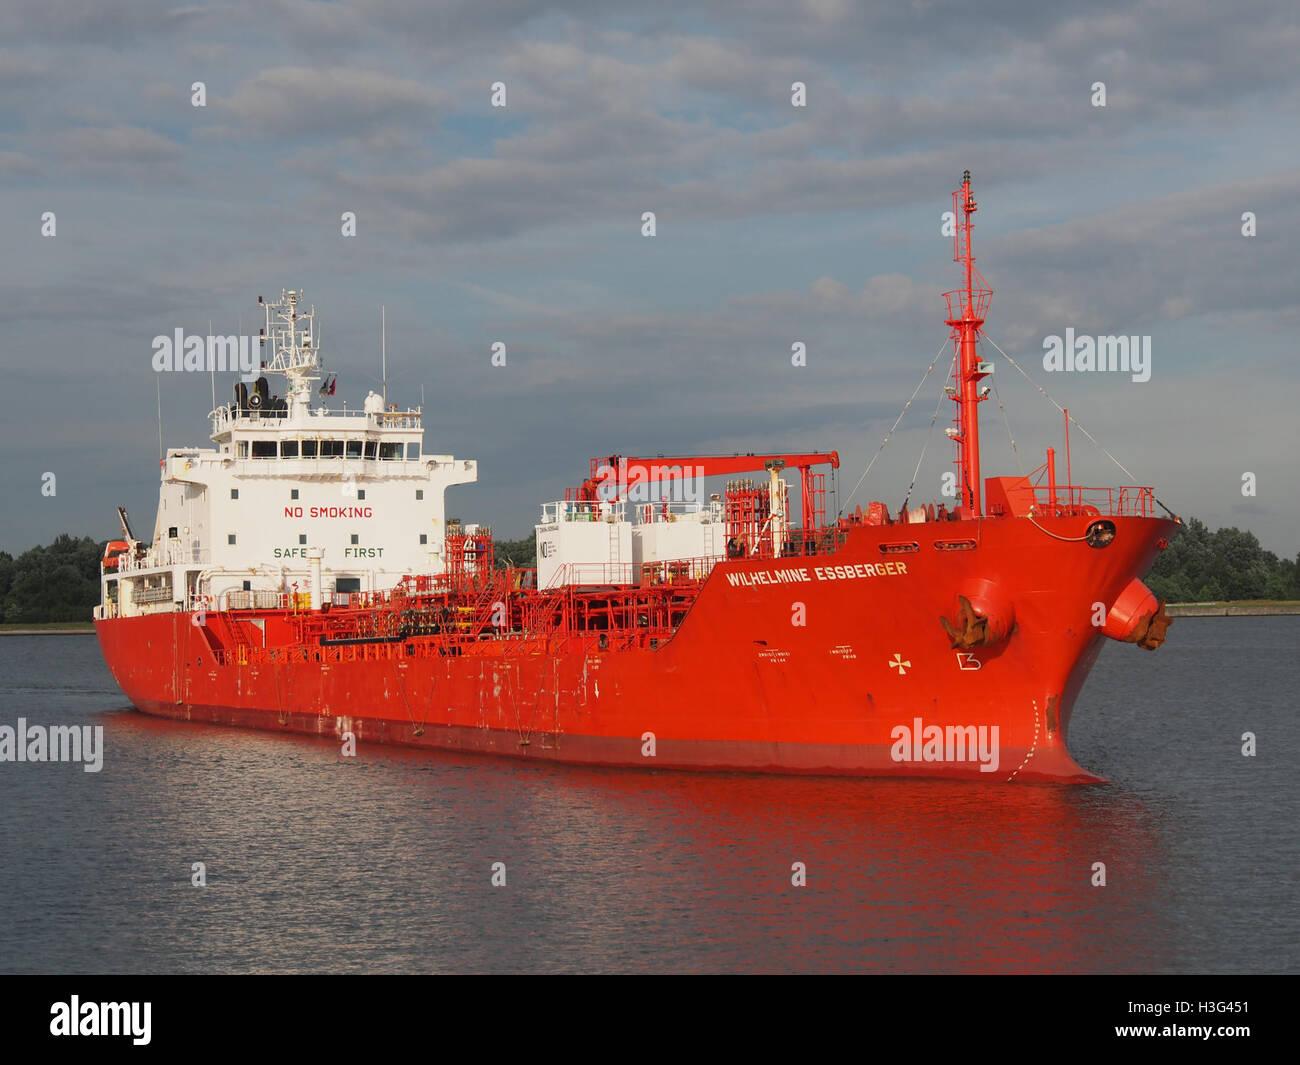 Wilhelmine Essberger (ship, 2005) IMO 9295440 Port of Antwerp pic1 - Stock Image